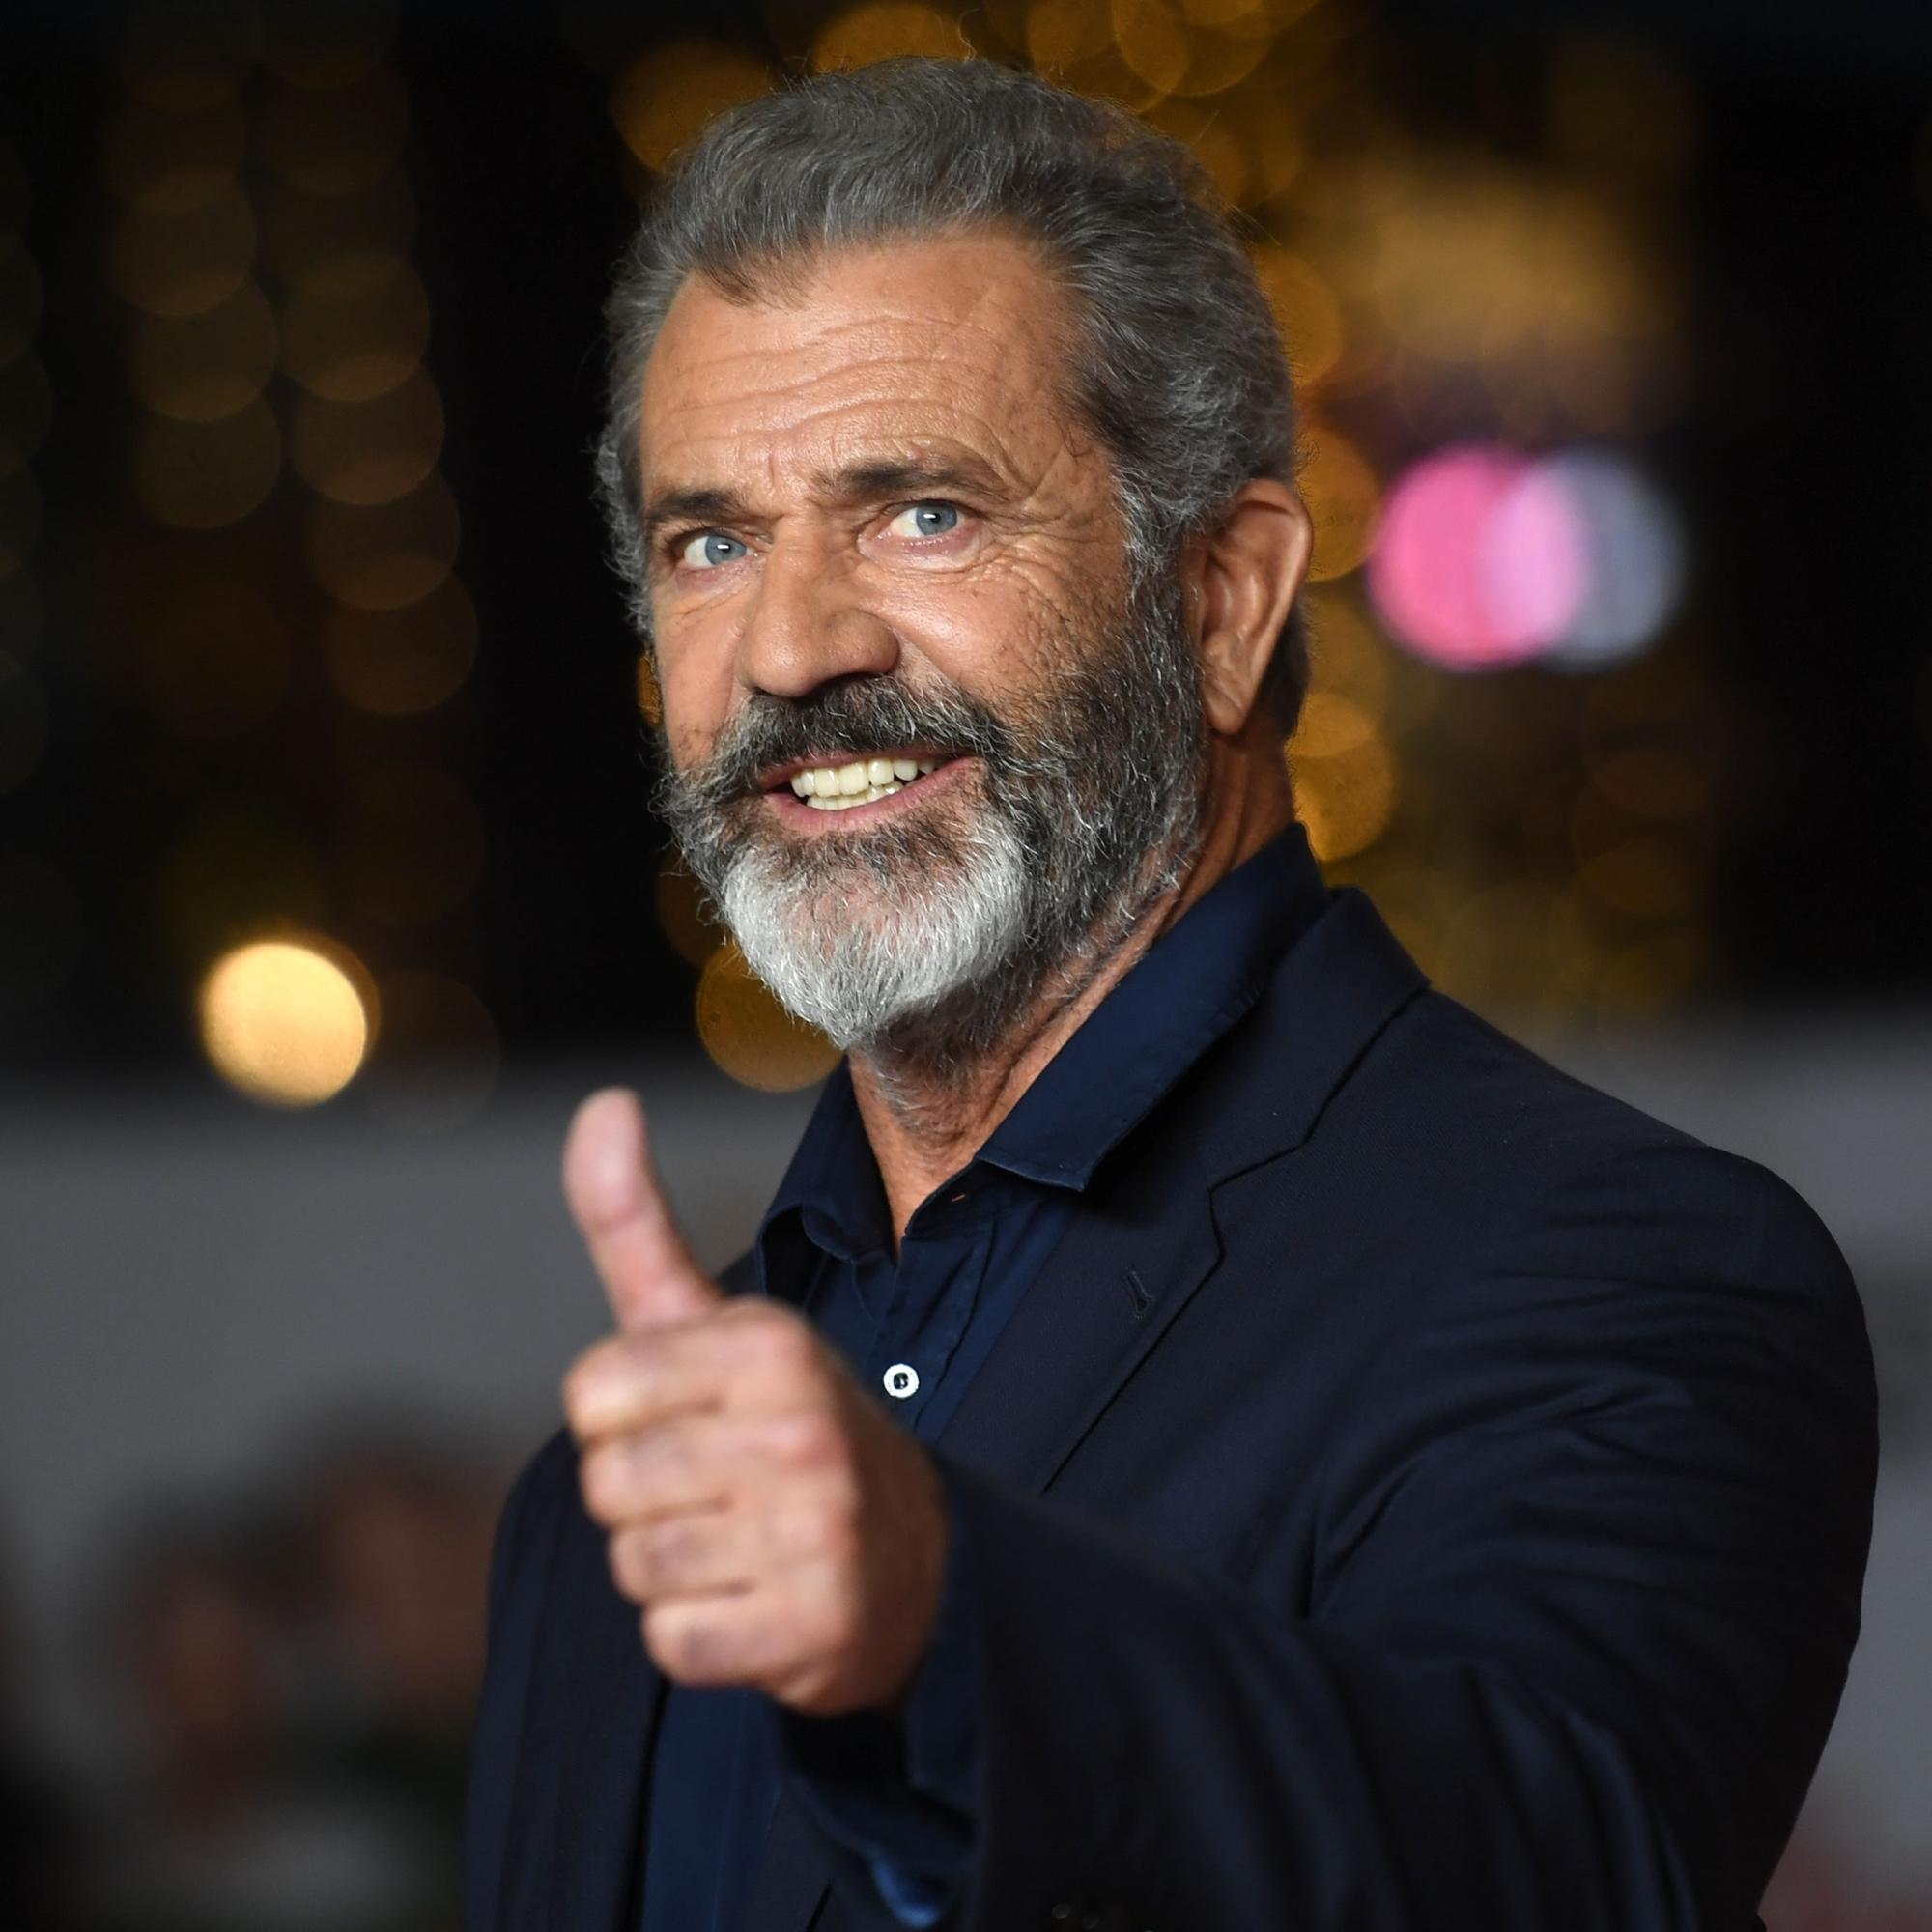 London, UNITED KINGDOM  - Daddy's Home 2 - UK Film Premiere in London  Pictured: Mel Gibson  BACKGRID UK 16 NOVEMBER 2017,Image: 355526743, License: Rights-managed, Restrictions: , Model Release: no, Credit line: ANTI / Backgrid UK / Profimedia